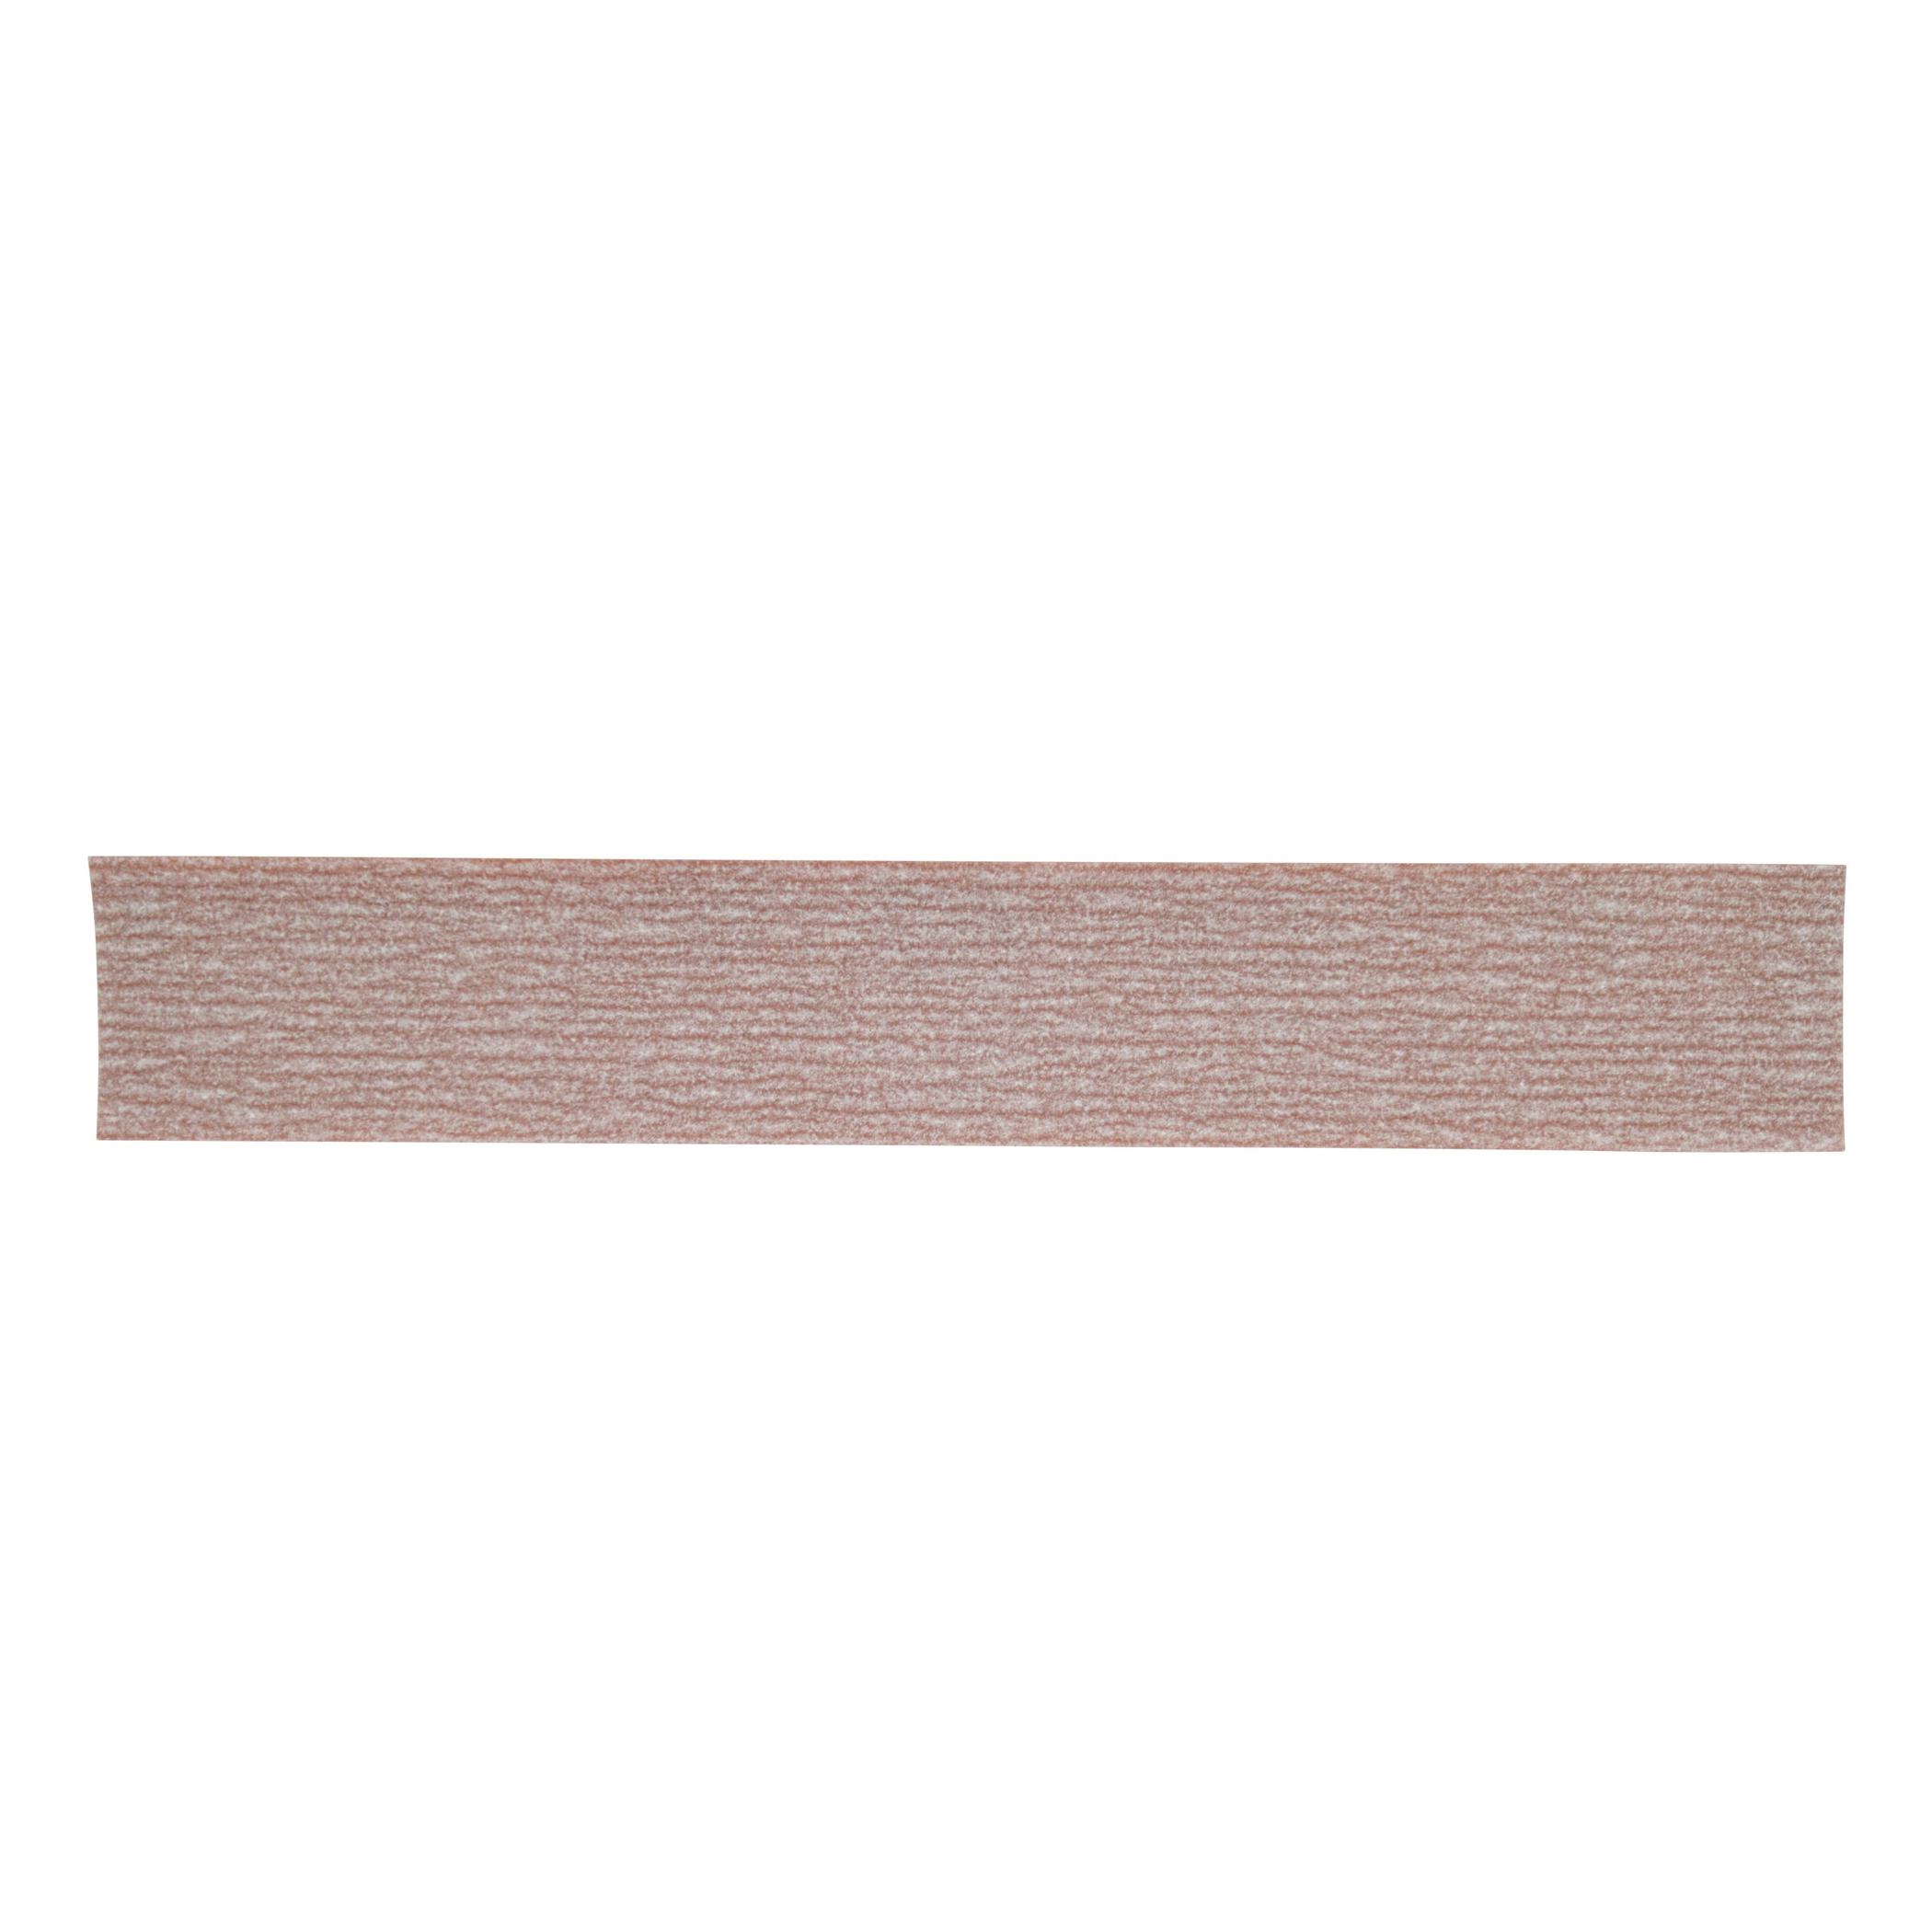 Norton® 66261131636 A275OP PSA Coated File Strip, 16-1/2 in L x 2-3/4 in W, P180 Grit, Fine Grade, Aluminum Oxide Abrasive, Anti-Loading Paper Backing